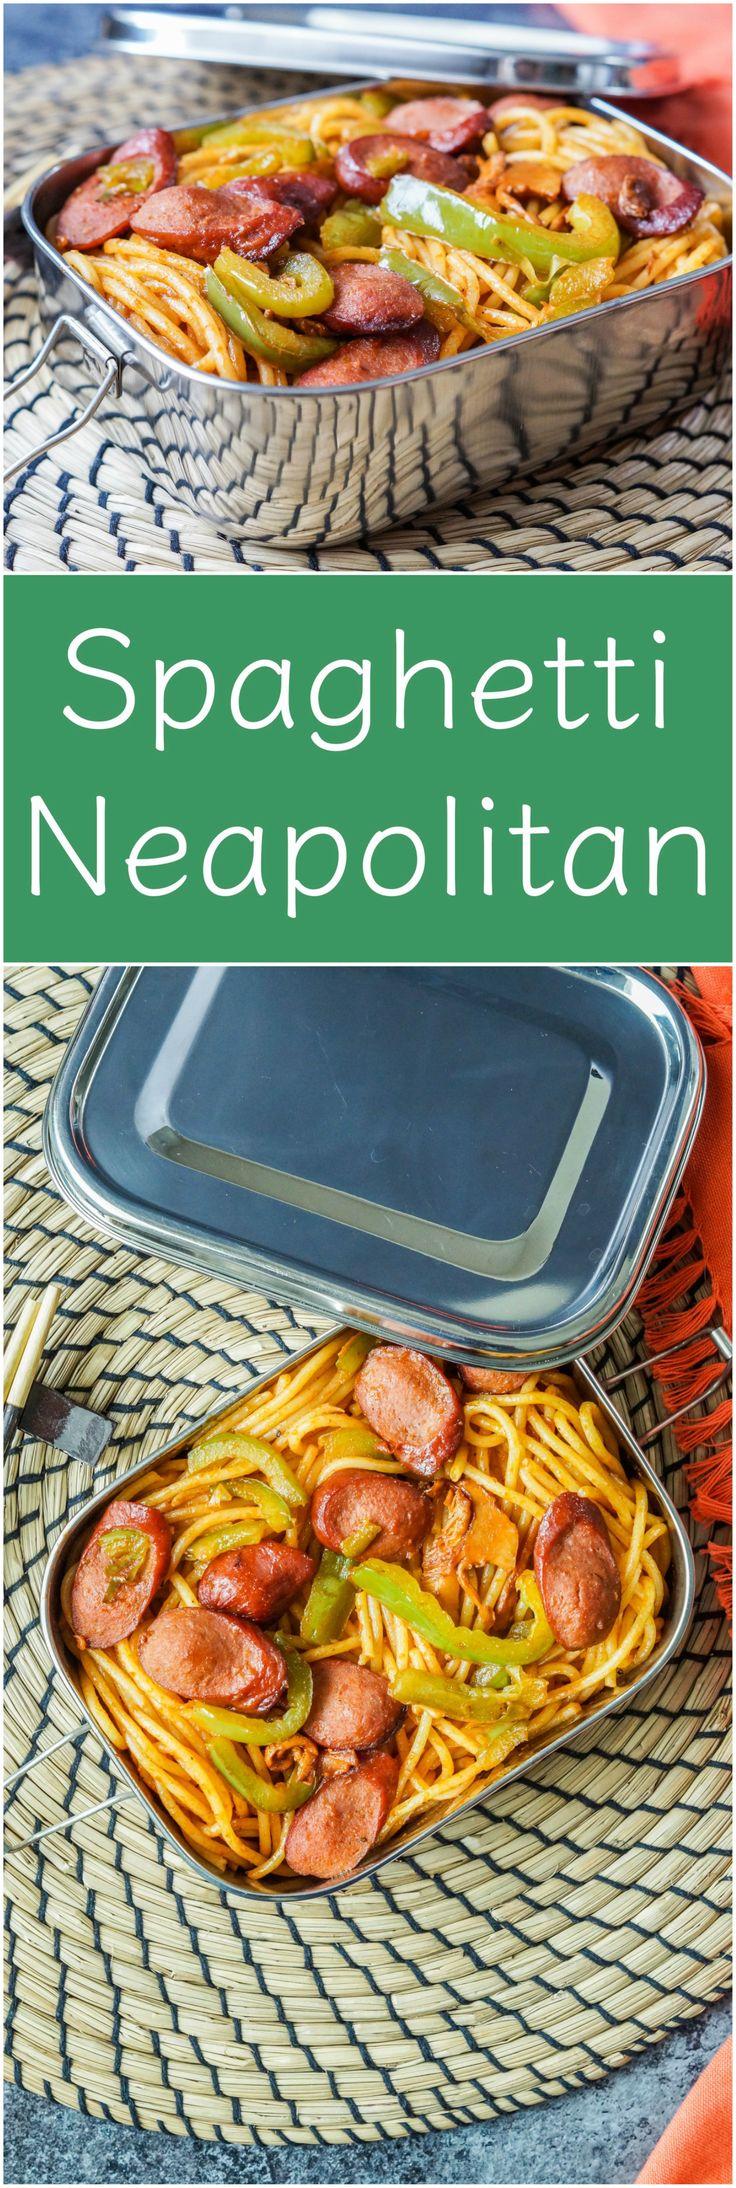 Japanese Spaghetti Neapolitan from the #cookbook, Effortless Bento. #ad.  #spaghetti #pasta #noodles #ketchup #Japan #Japanese #recipe #hotdog #bento